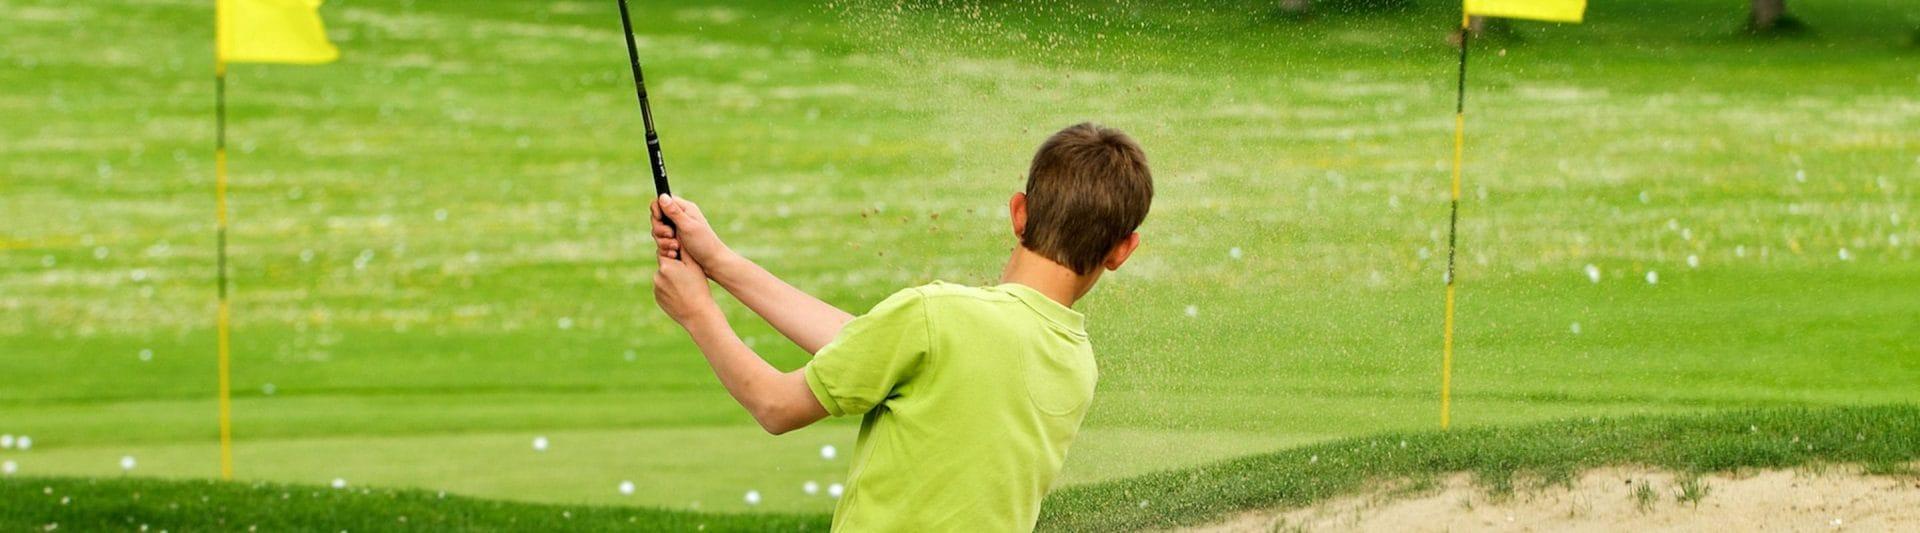 boy golfing